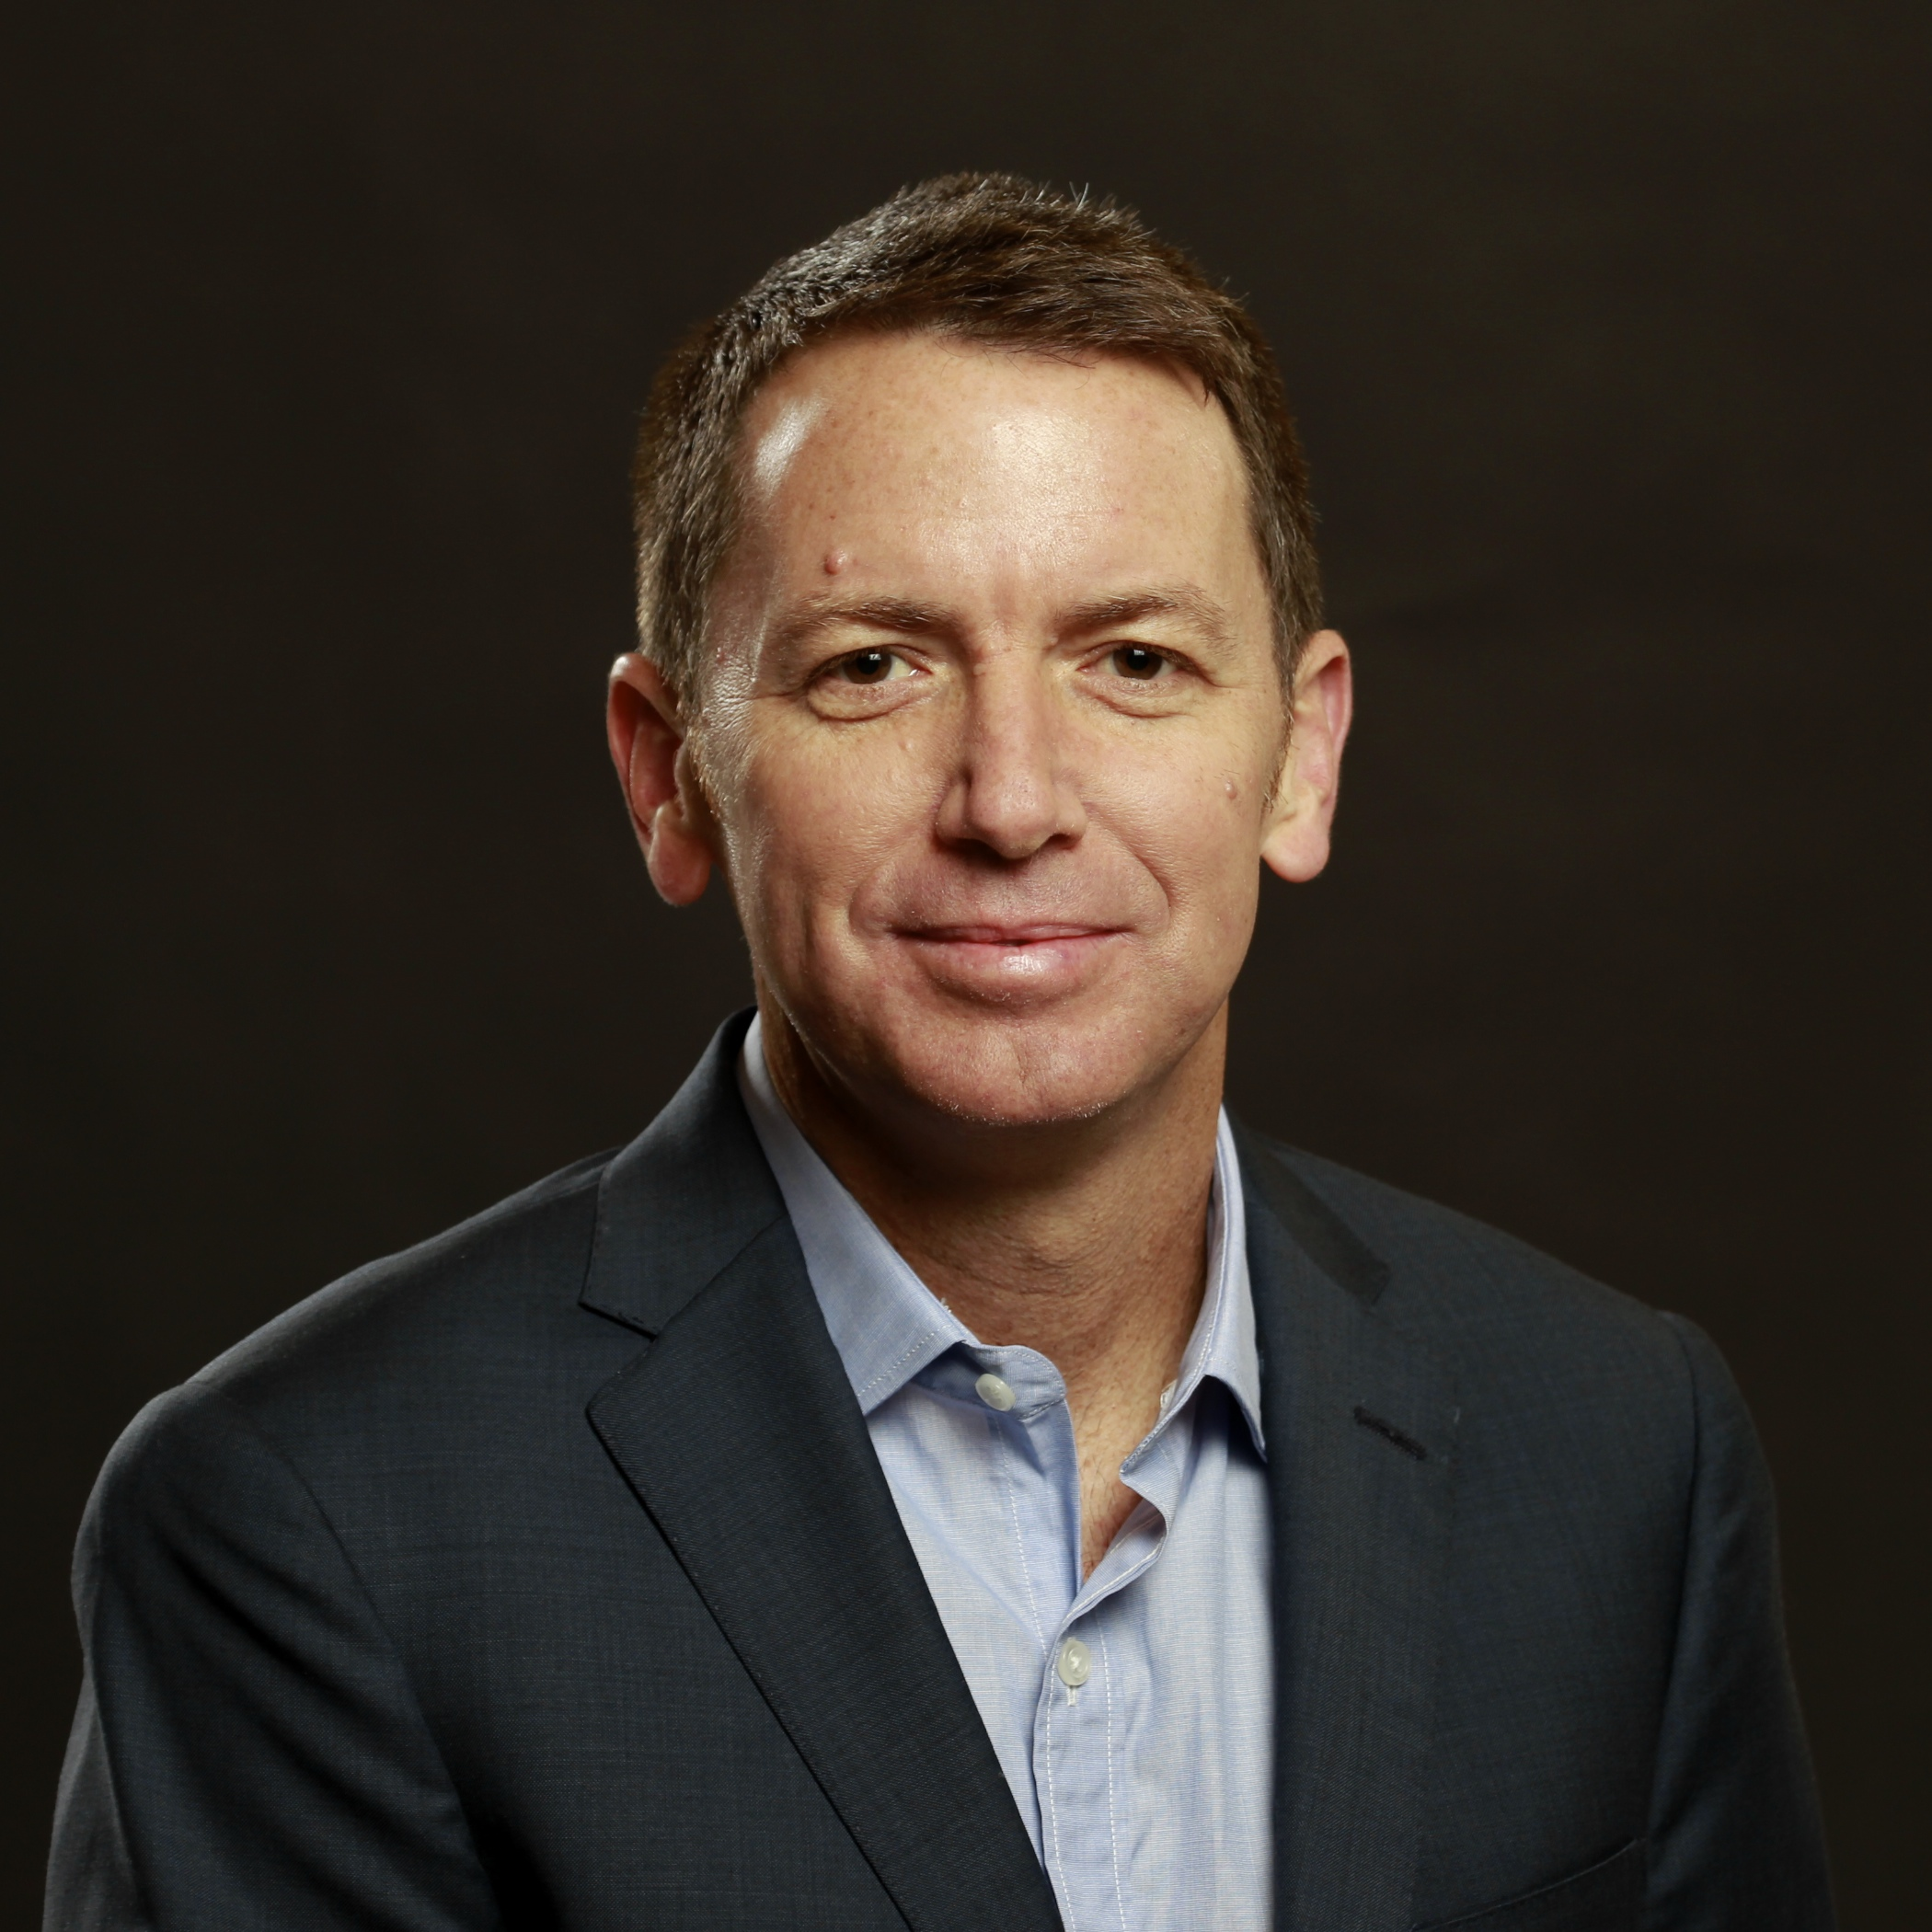 Goneryl nativo traje  NIKE, Inc. - Investor Relations - Investors - Corporate Governance - Nike,  Inc Management